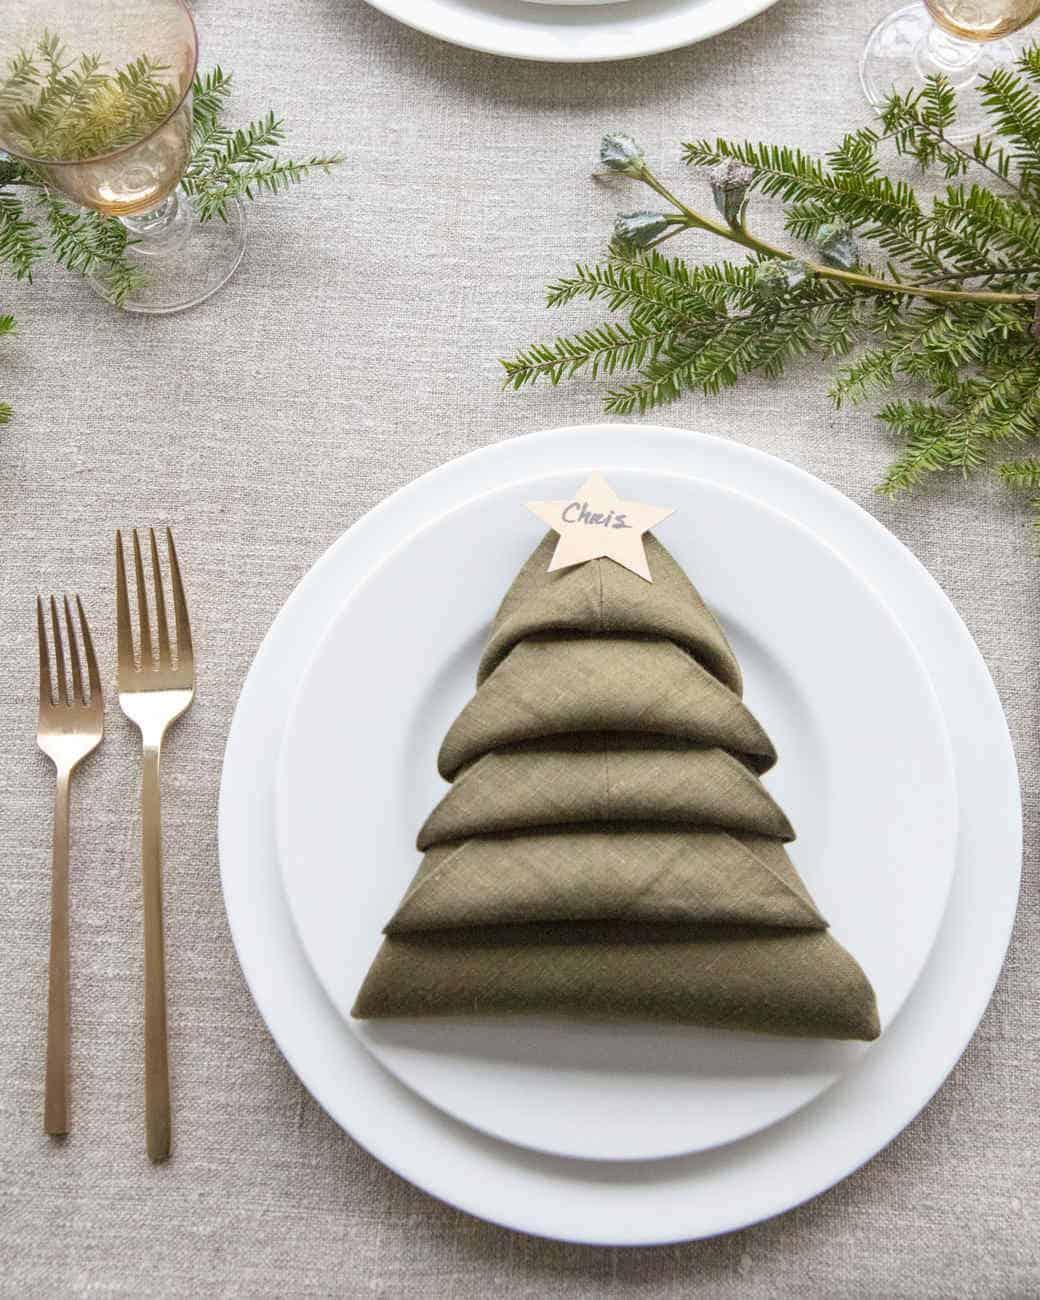 xhrisrnas tree napkins